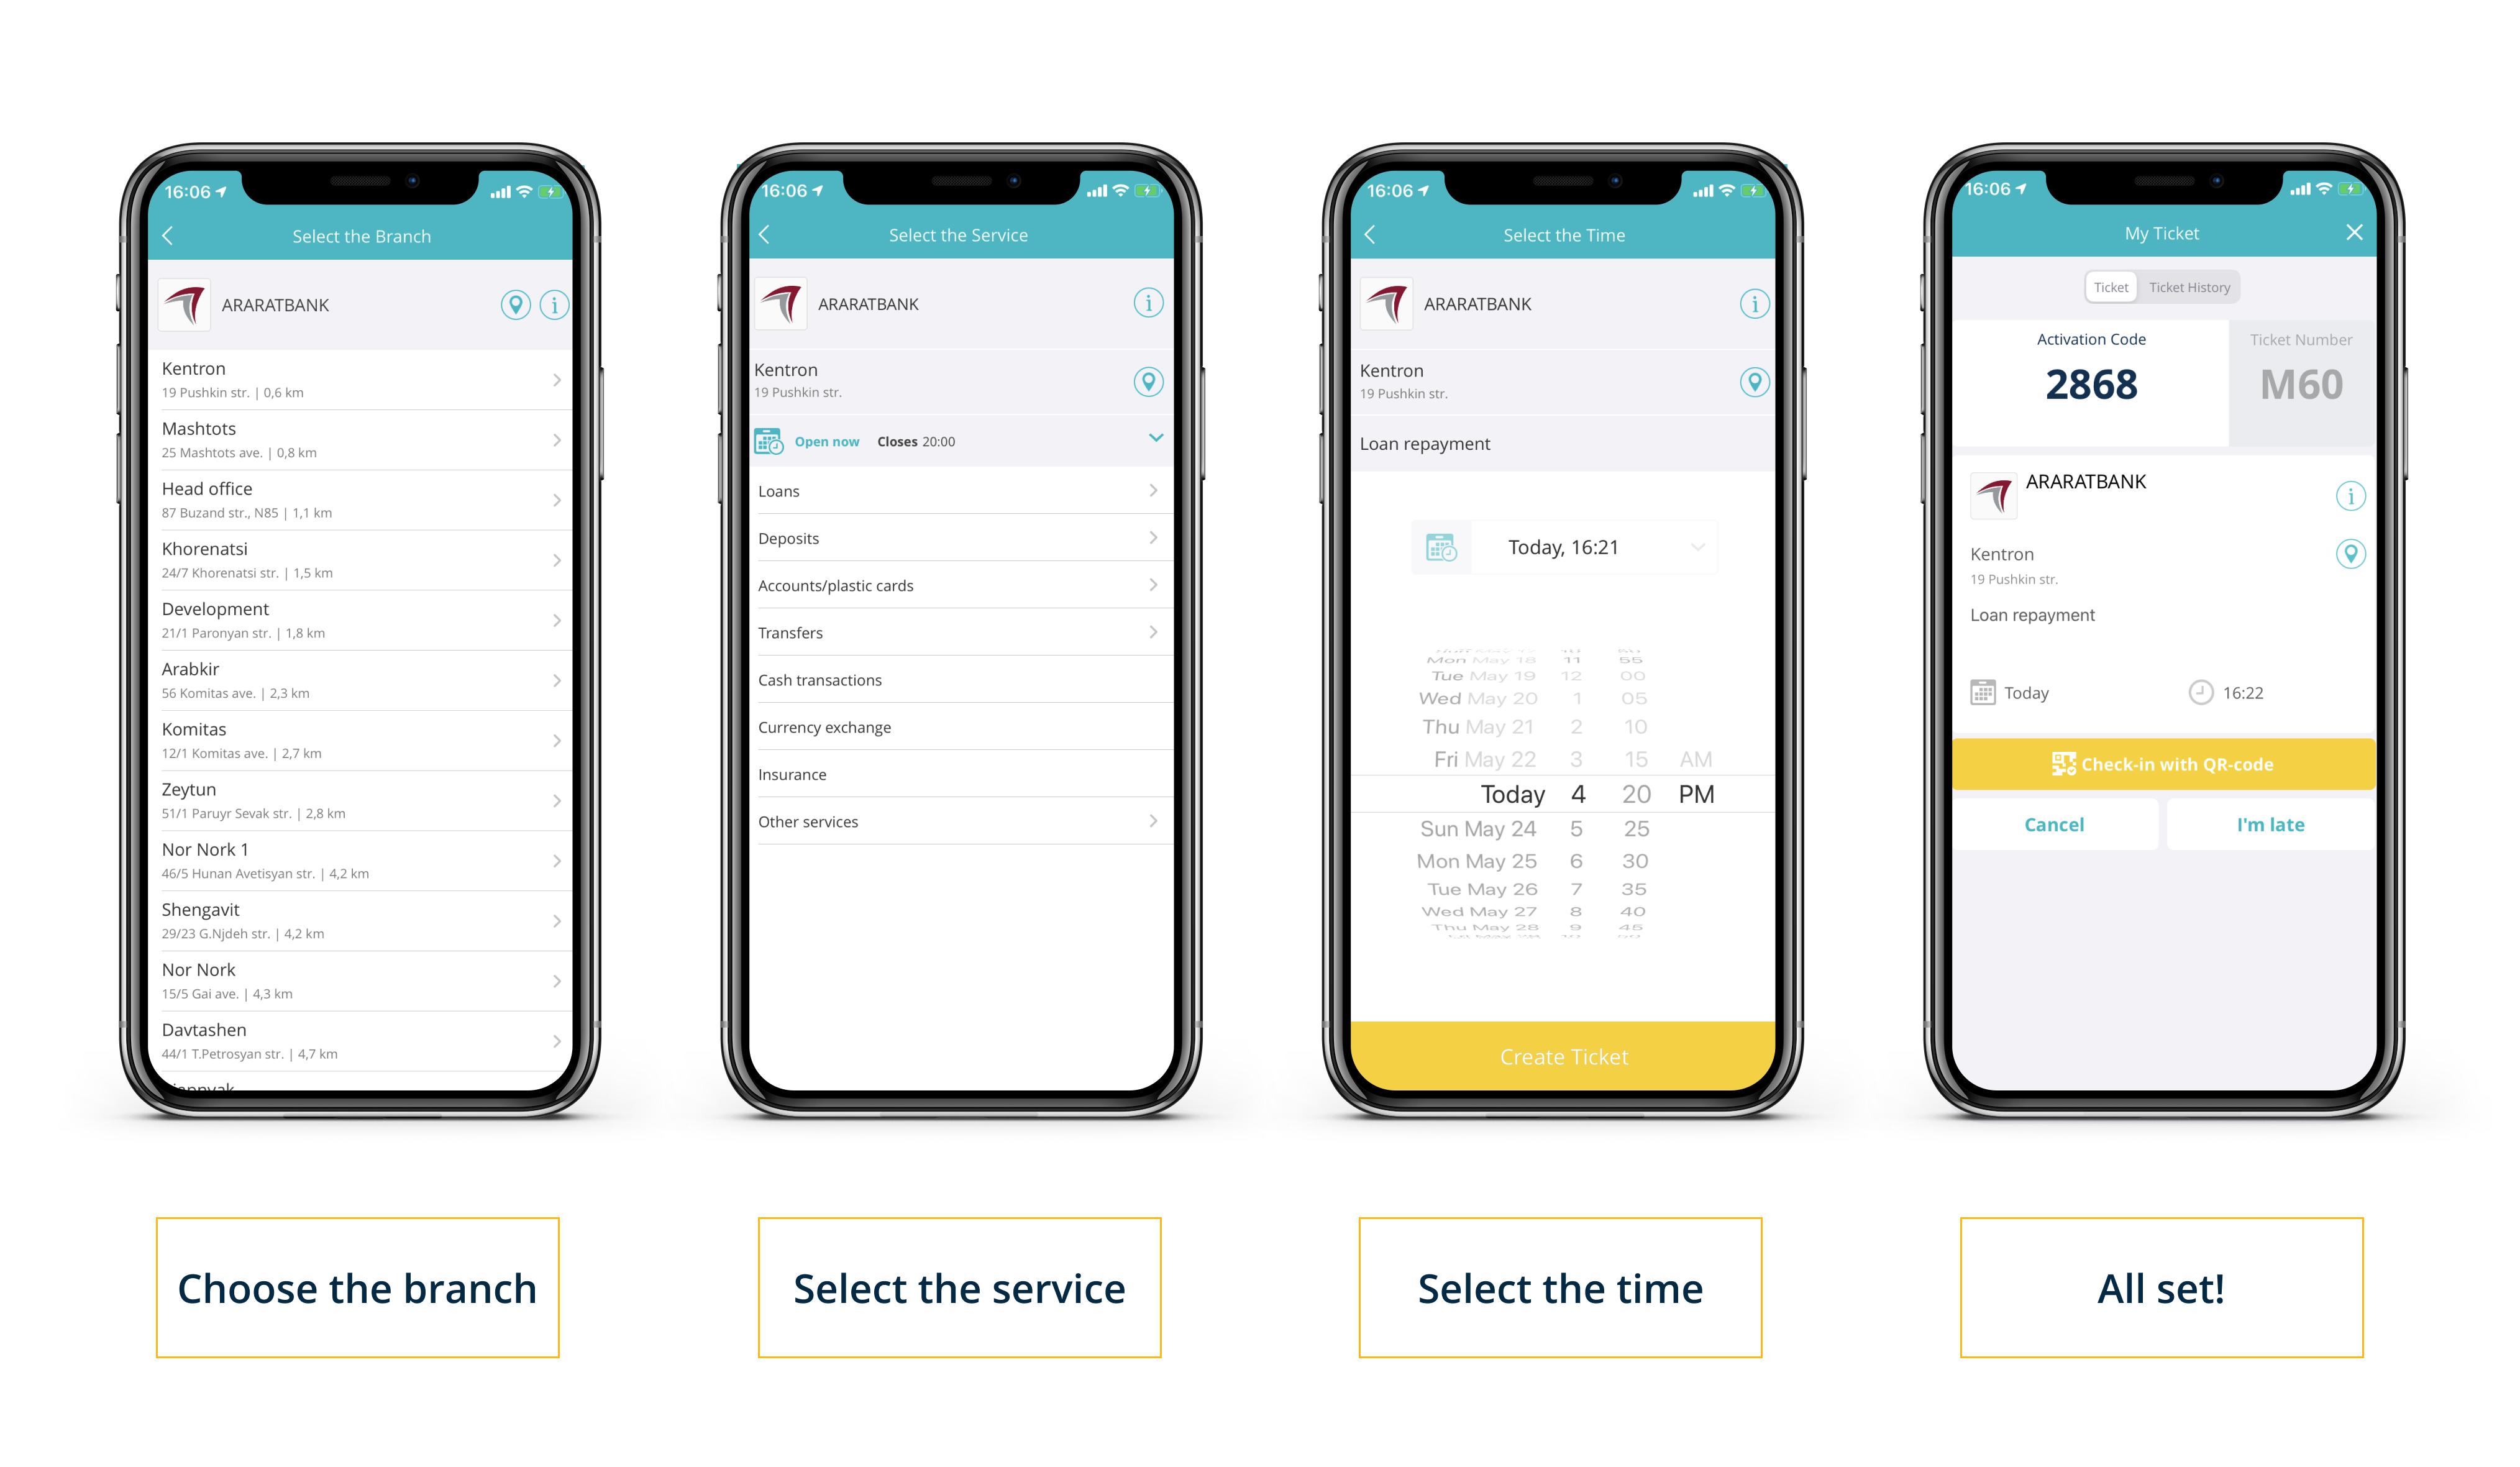 Araratbank in the app